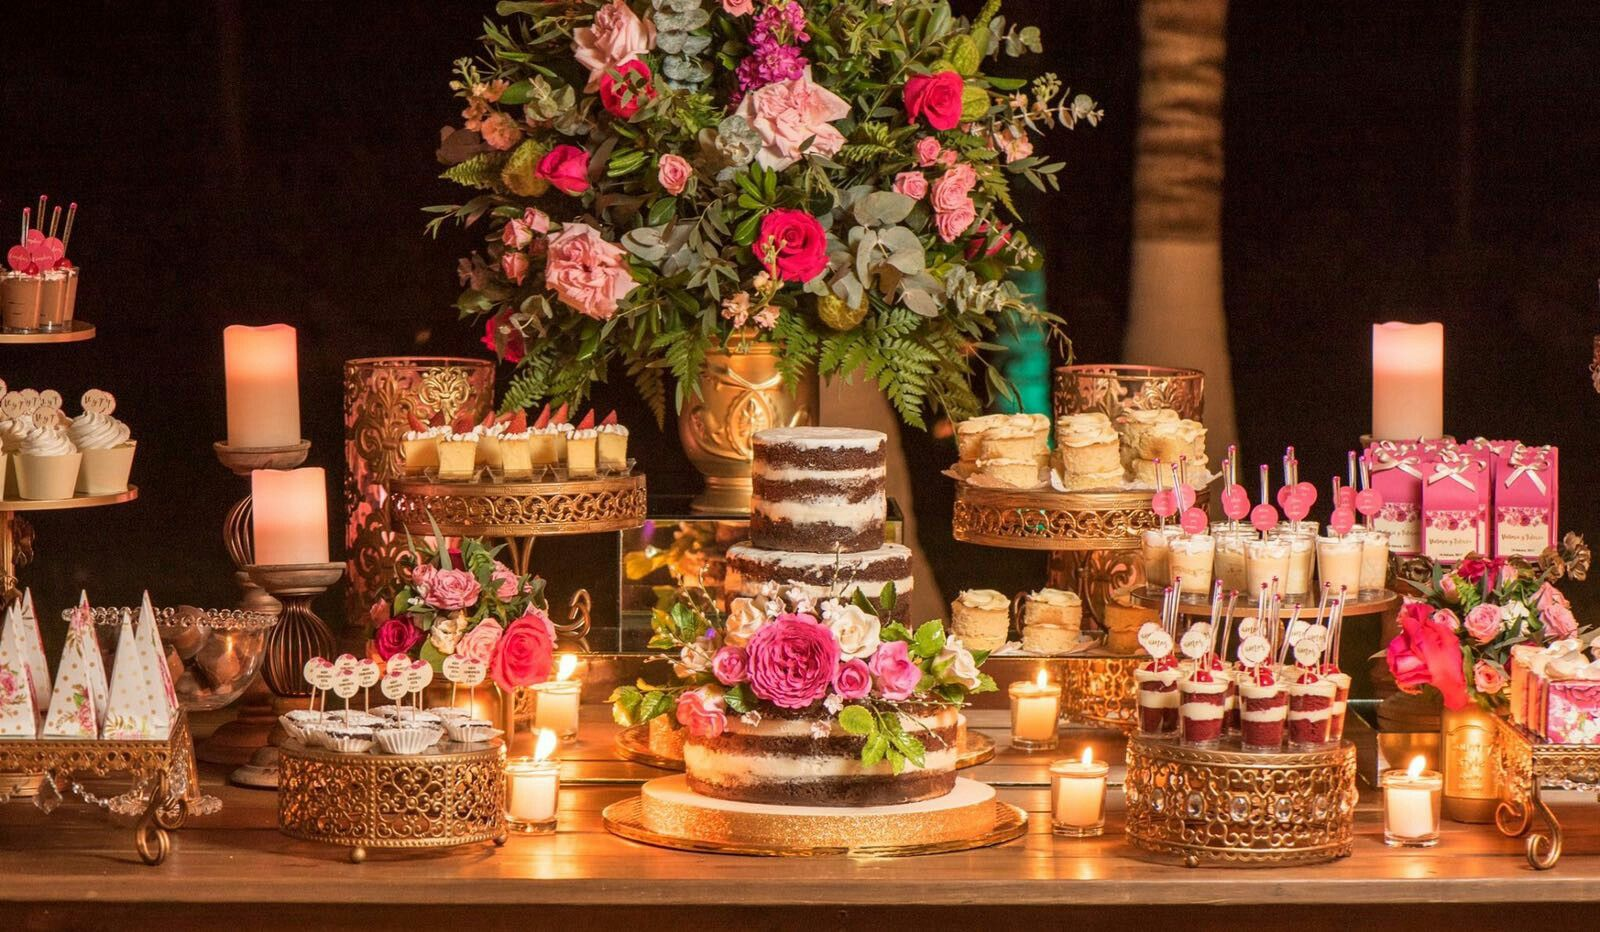 Naked wedding cake gumpaste flowers cancun riviera maya wedding naked wedding cake gumpaste flowers cancun riviera maya wedding planner maryta osorio izmirmasajfo